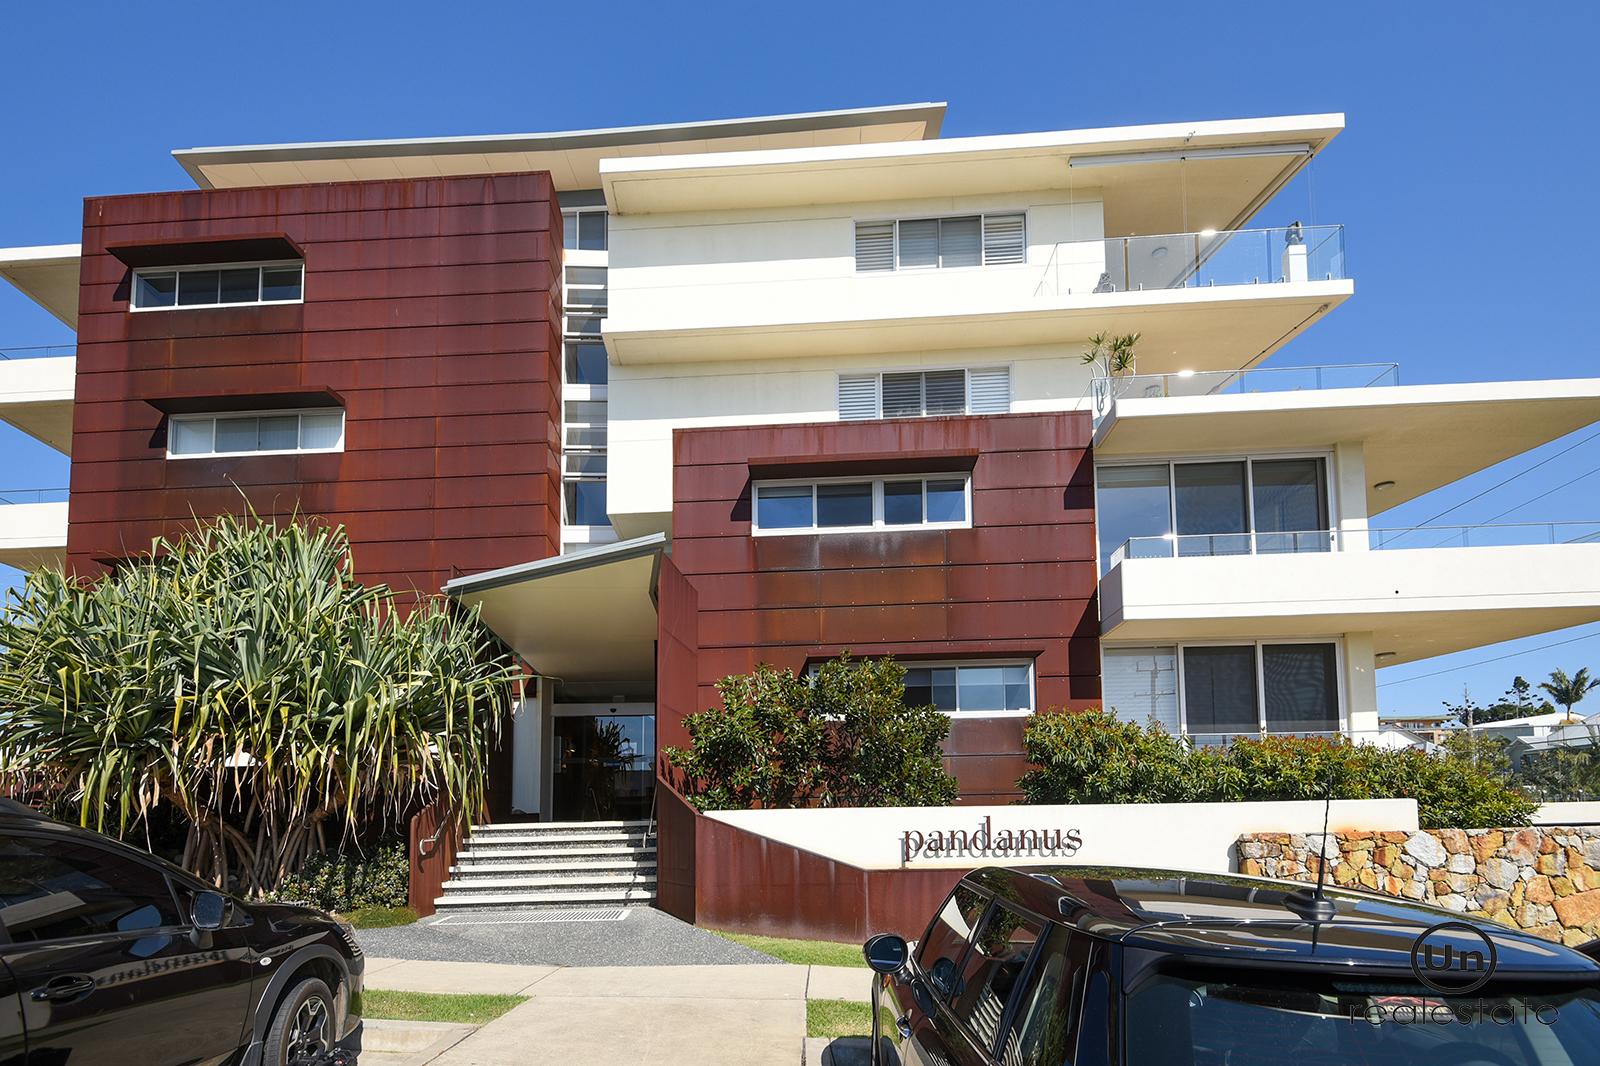 104/7 Edgar Street, Coffs Harbour - Pandaus buildi